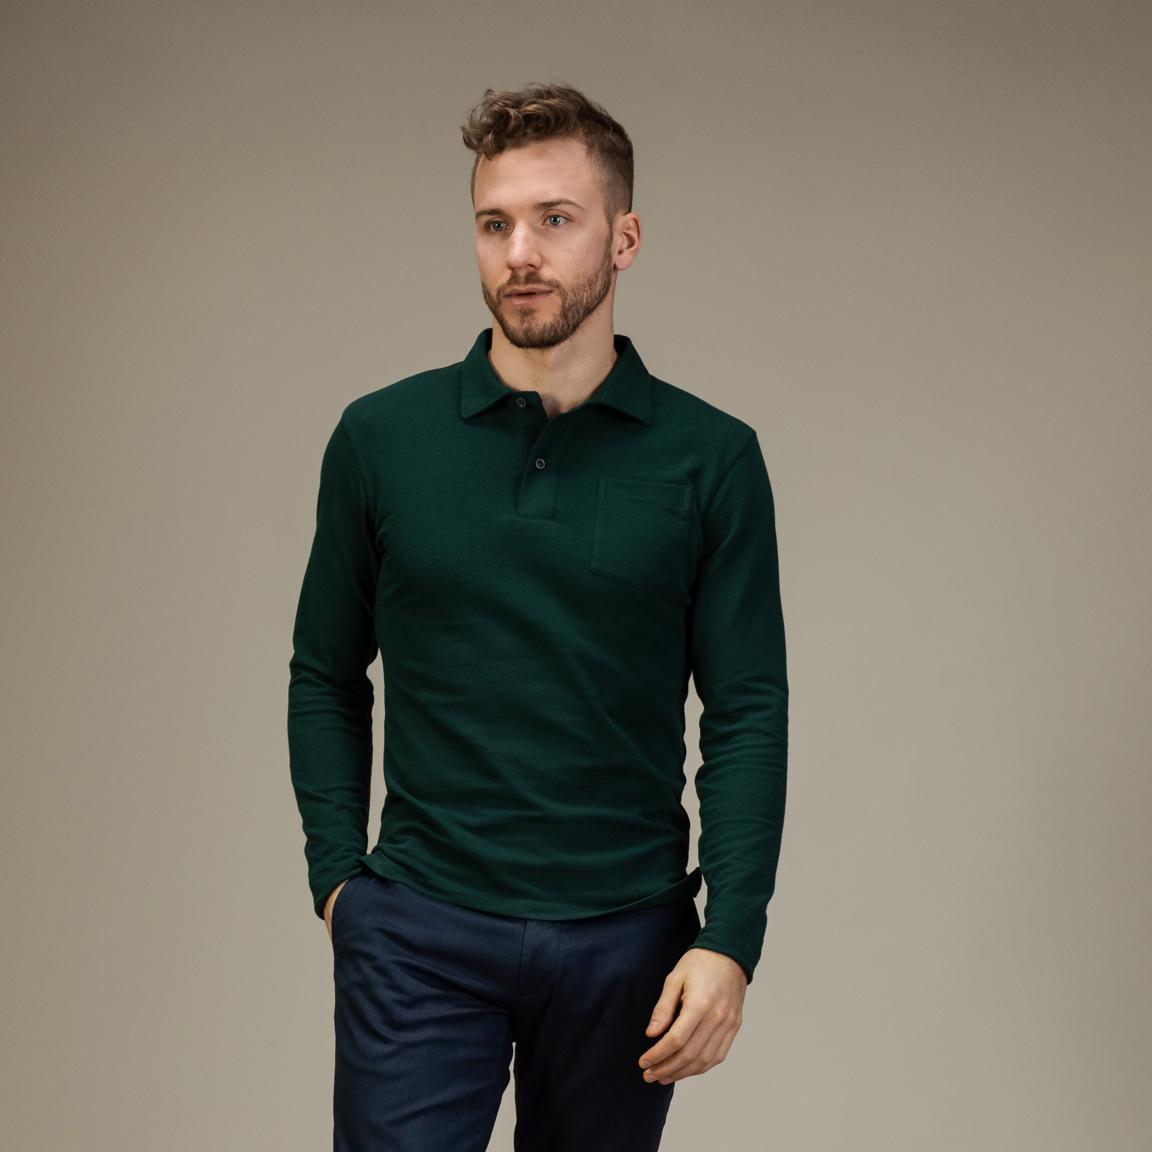 Smaragdgrünes Polohemd mit langen Ärmeln